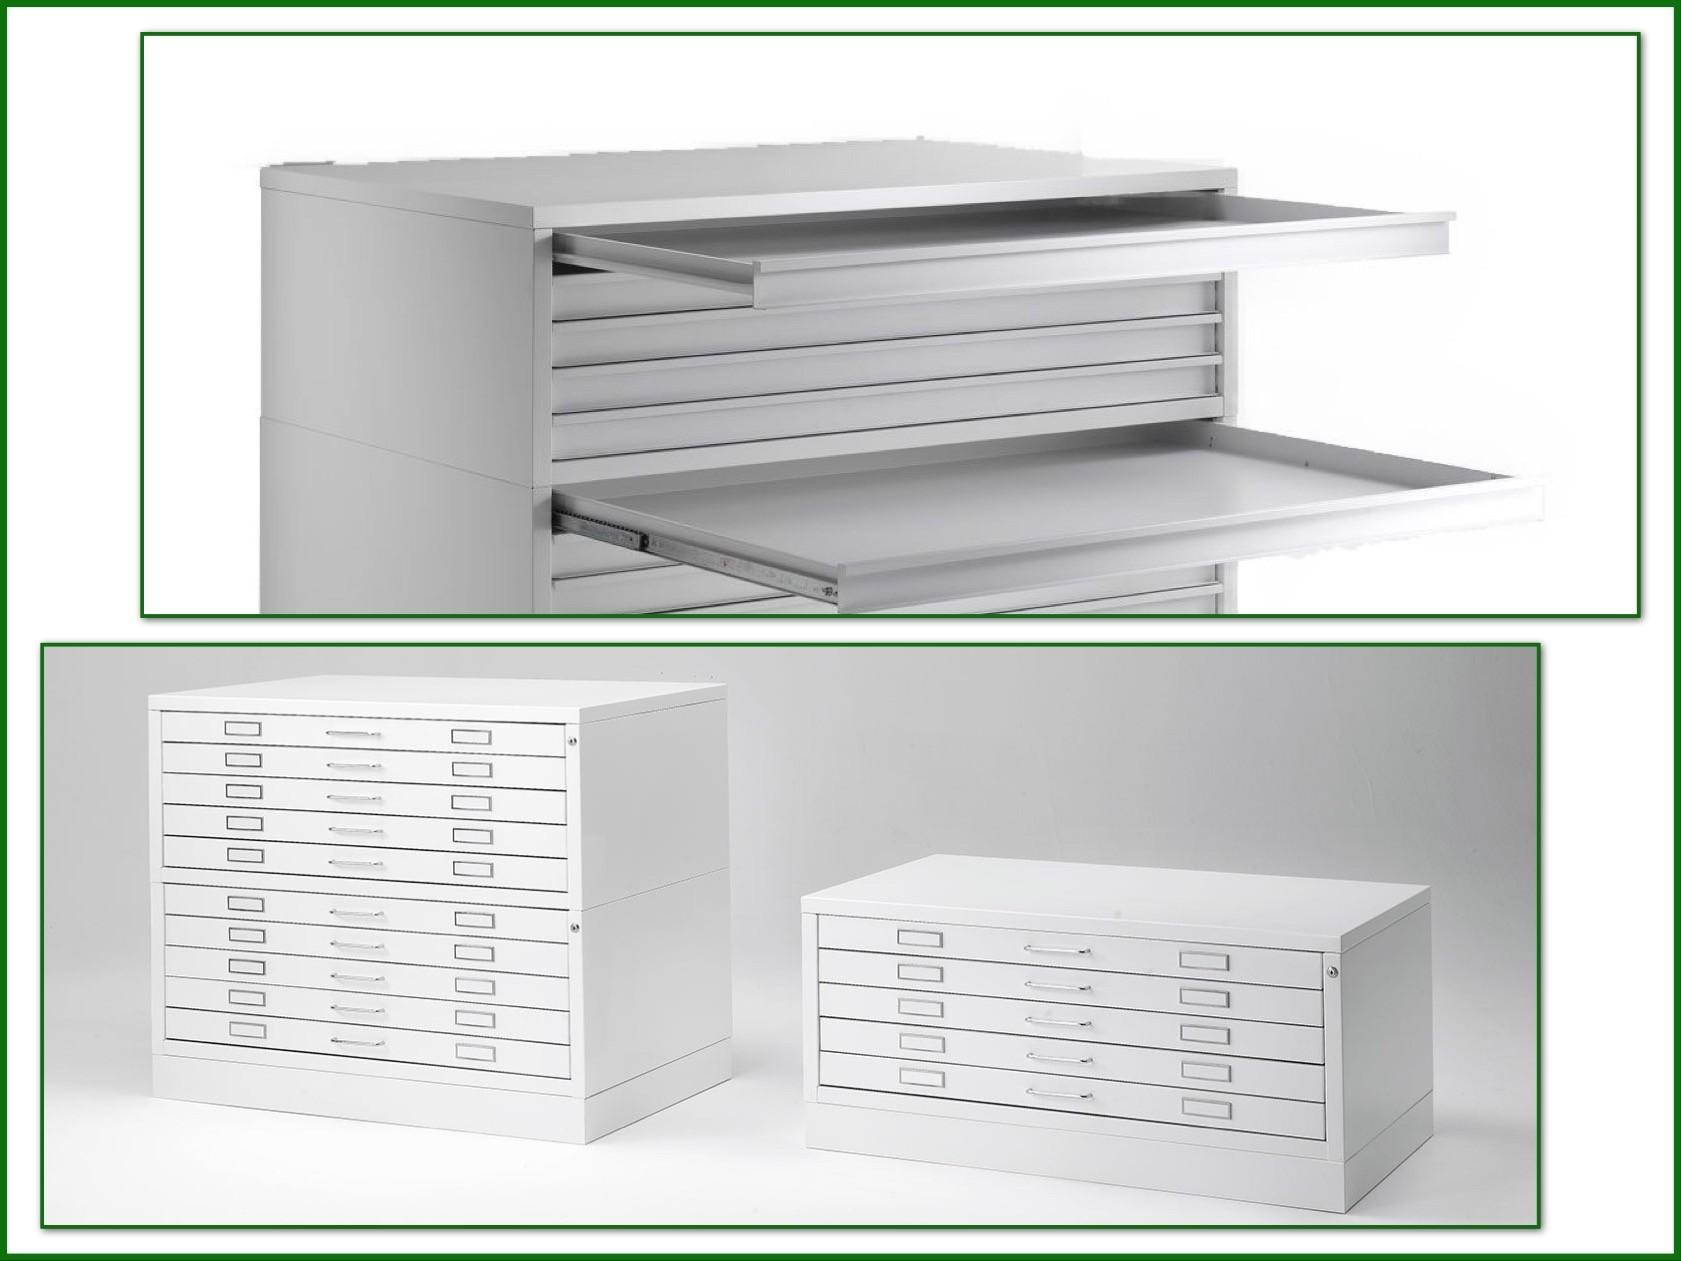 Horizontal file cabinet